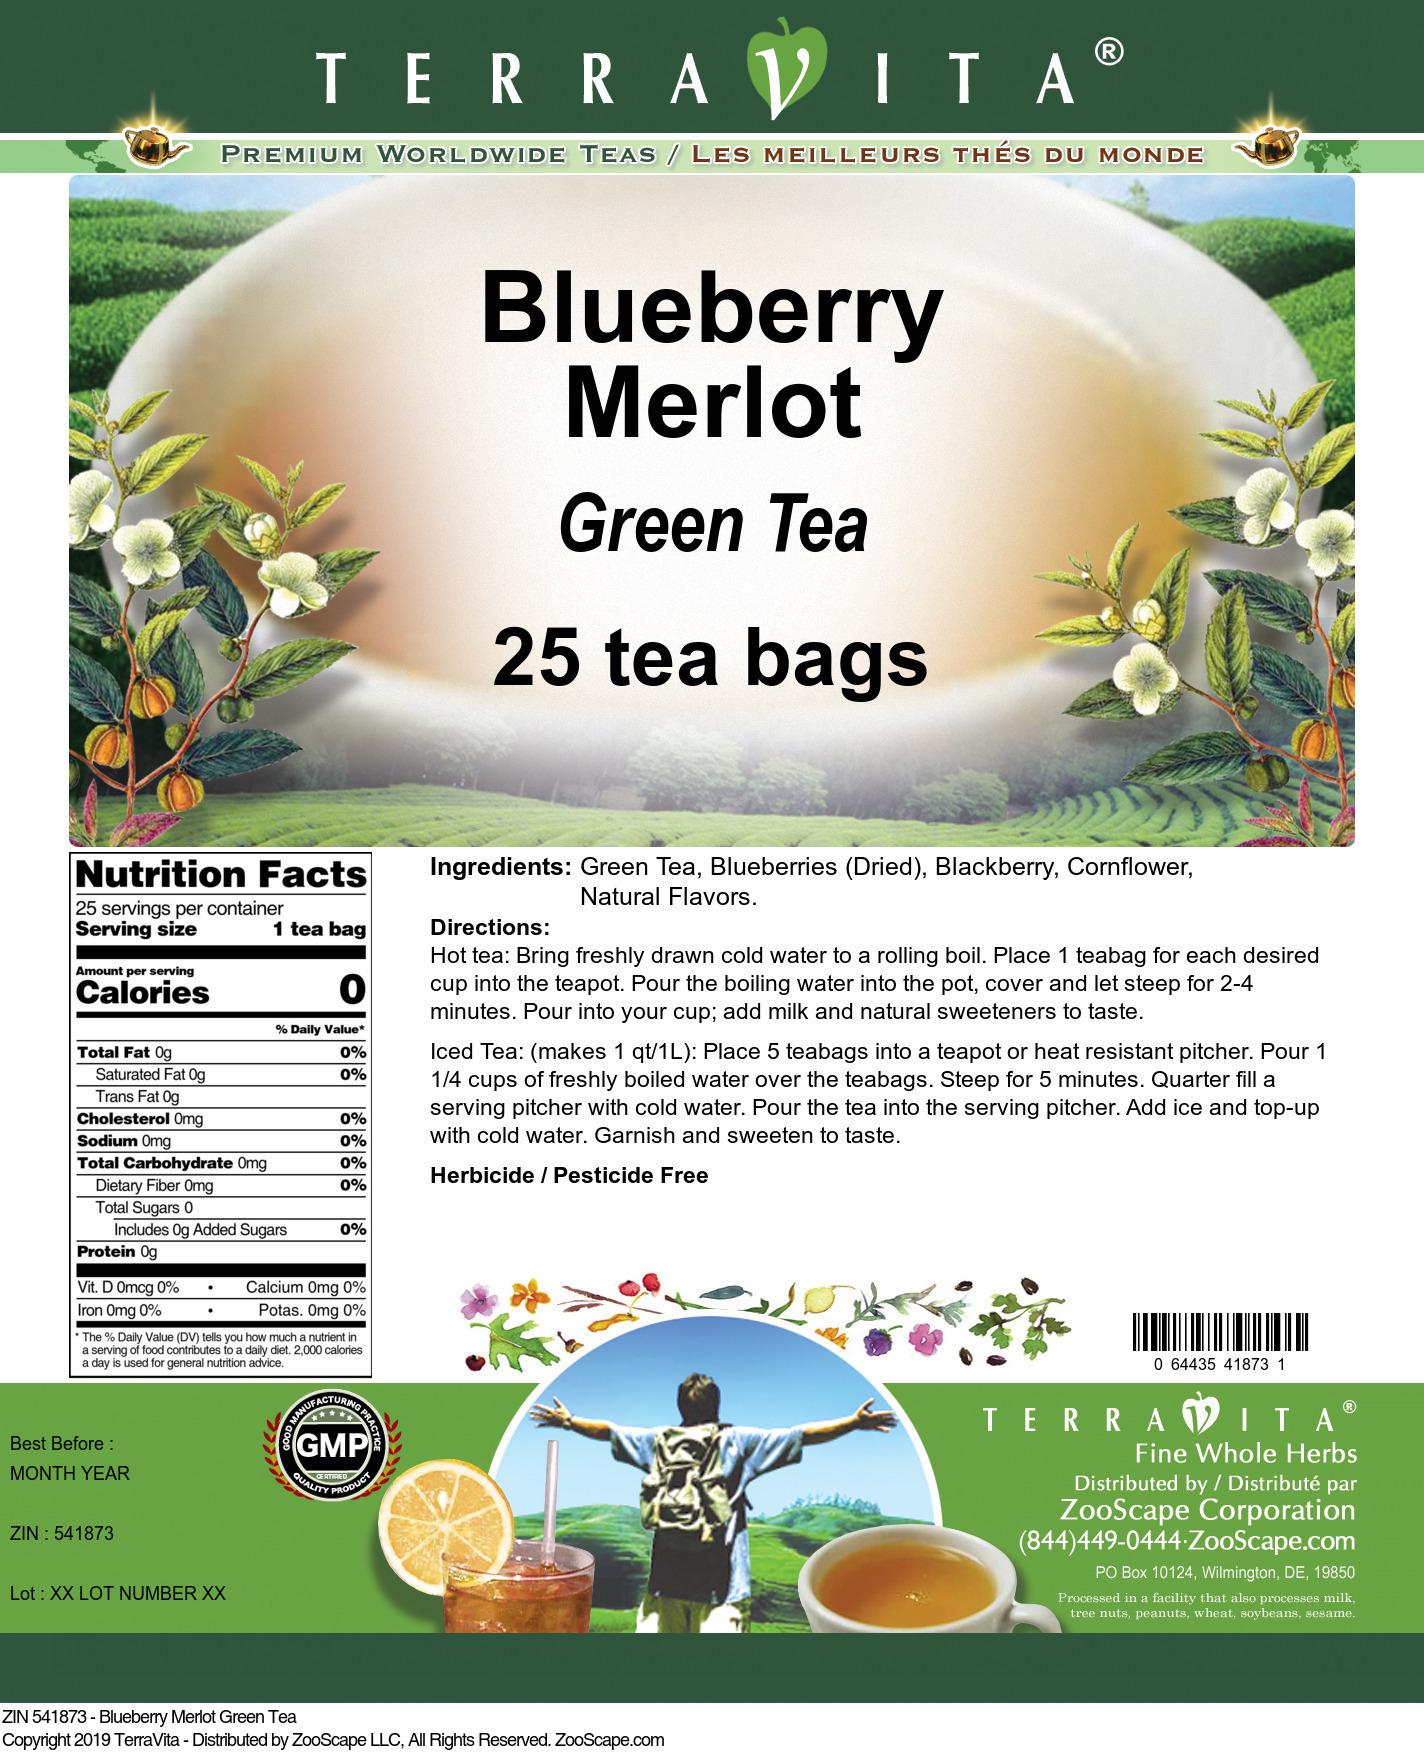 Blueberry Merlot Green Tea